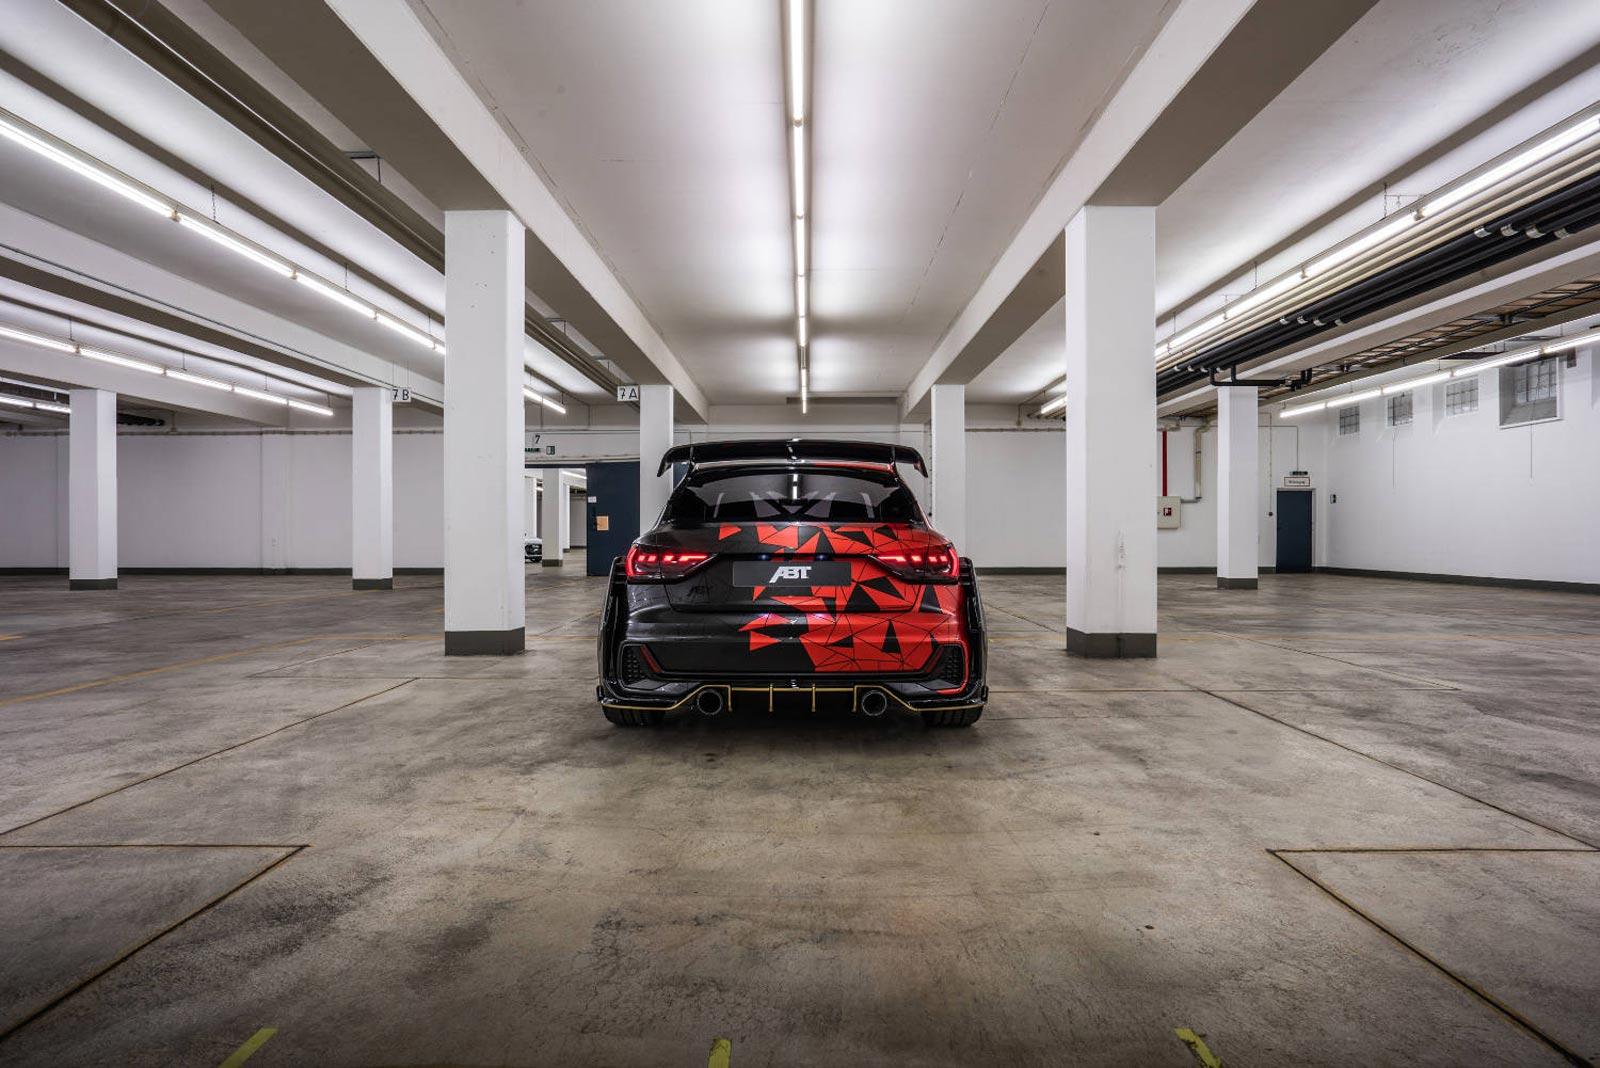 ProAuto - Abt Sportsline Audi A1 1of1 - spektakl u malom